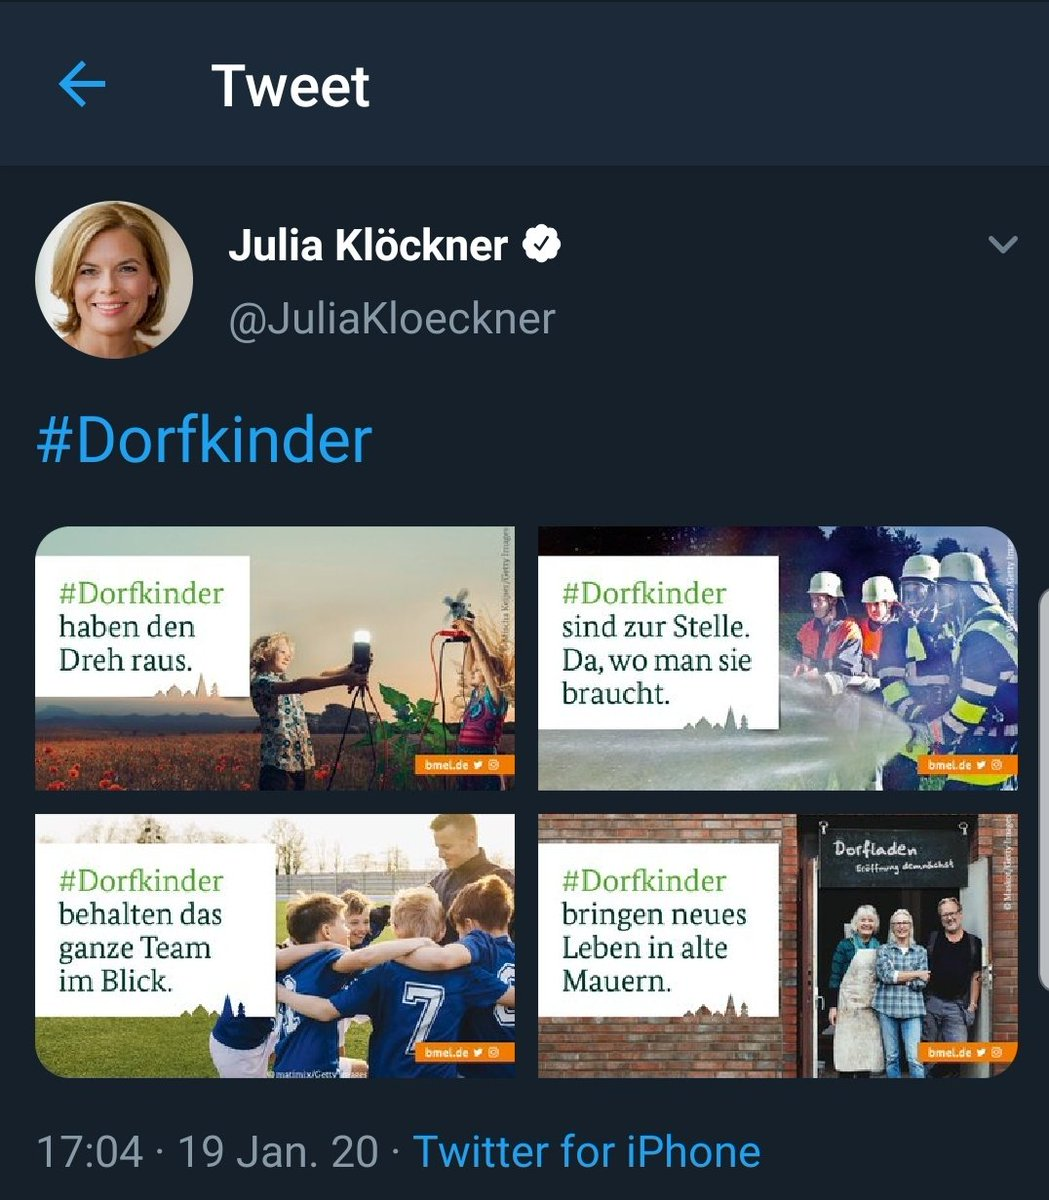 #Dorfkinder